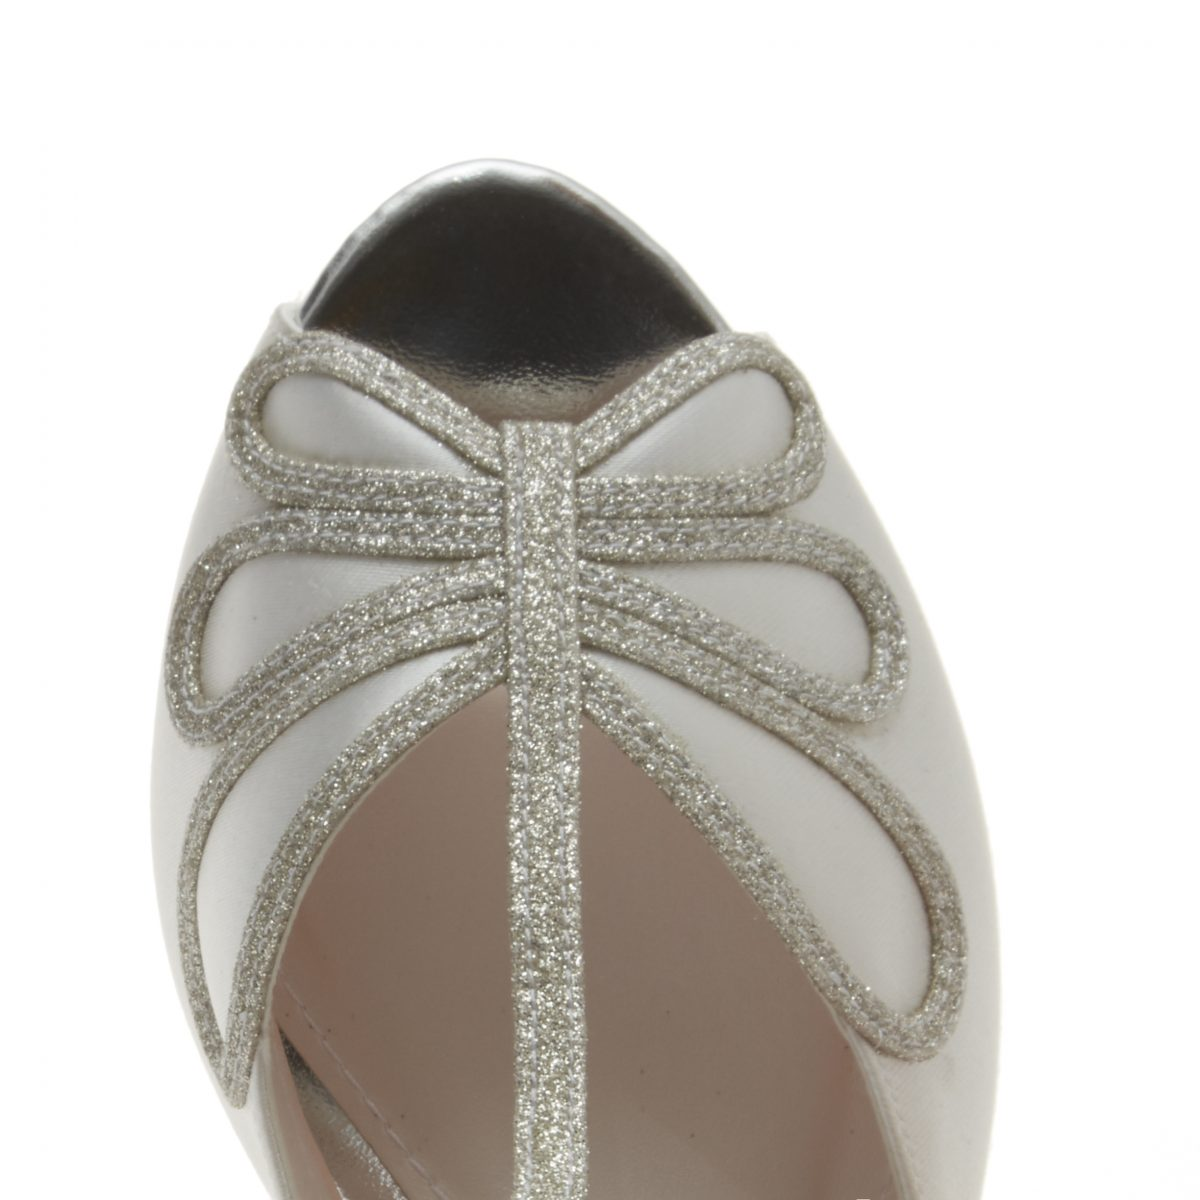 Rainbow Club Harlow - Peep Toe Satin/ Silver Shimmer Shoe 3